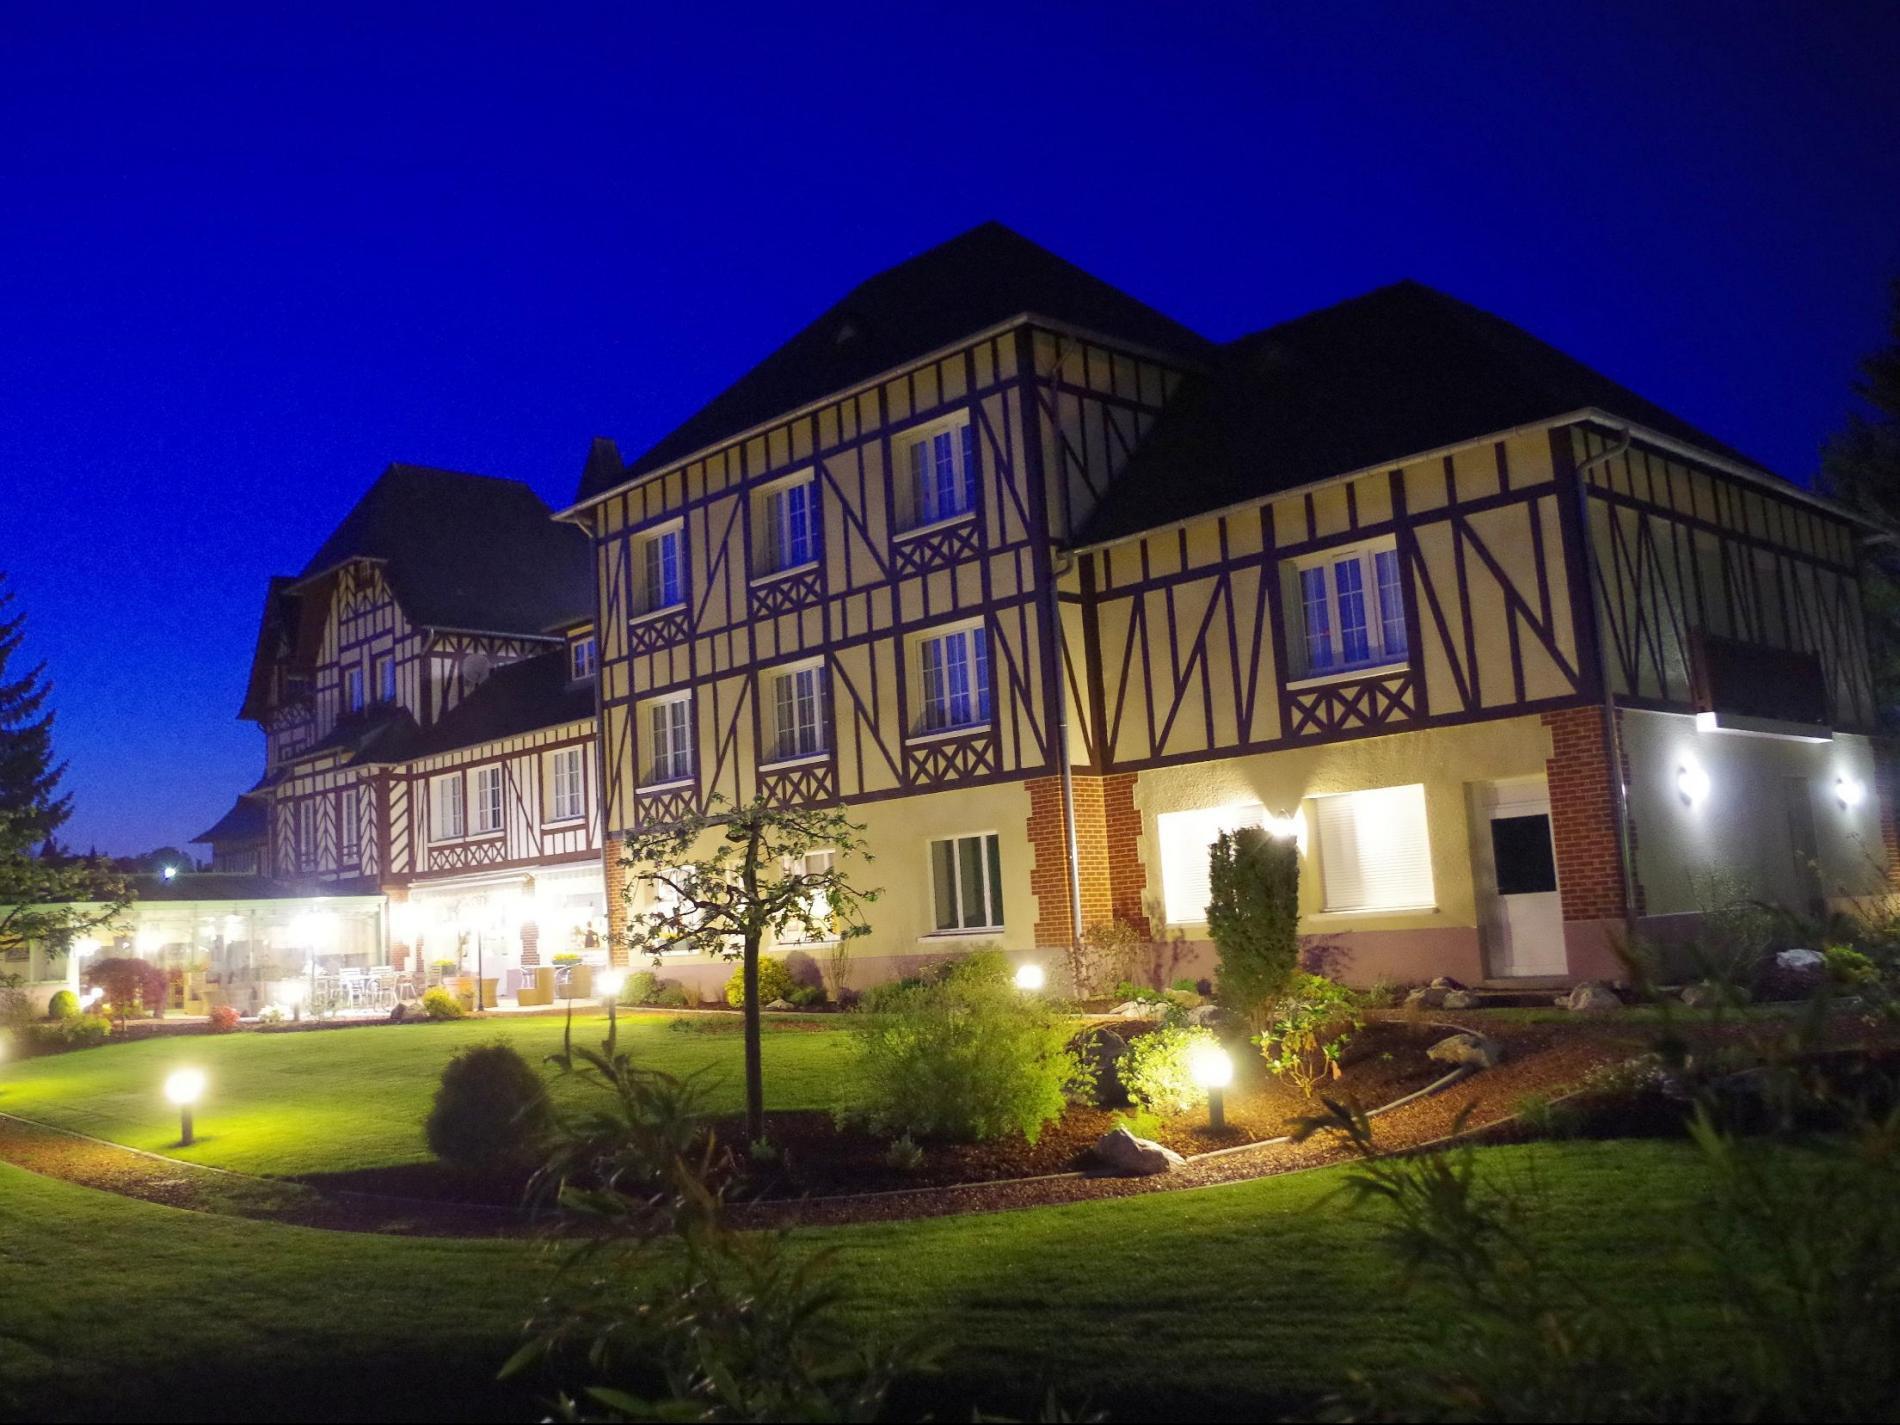 Villa des Houx - Hotel de charme en Normandie